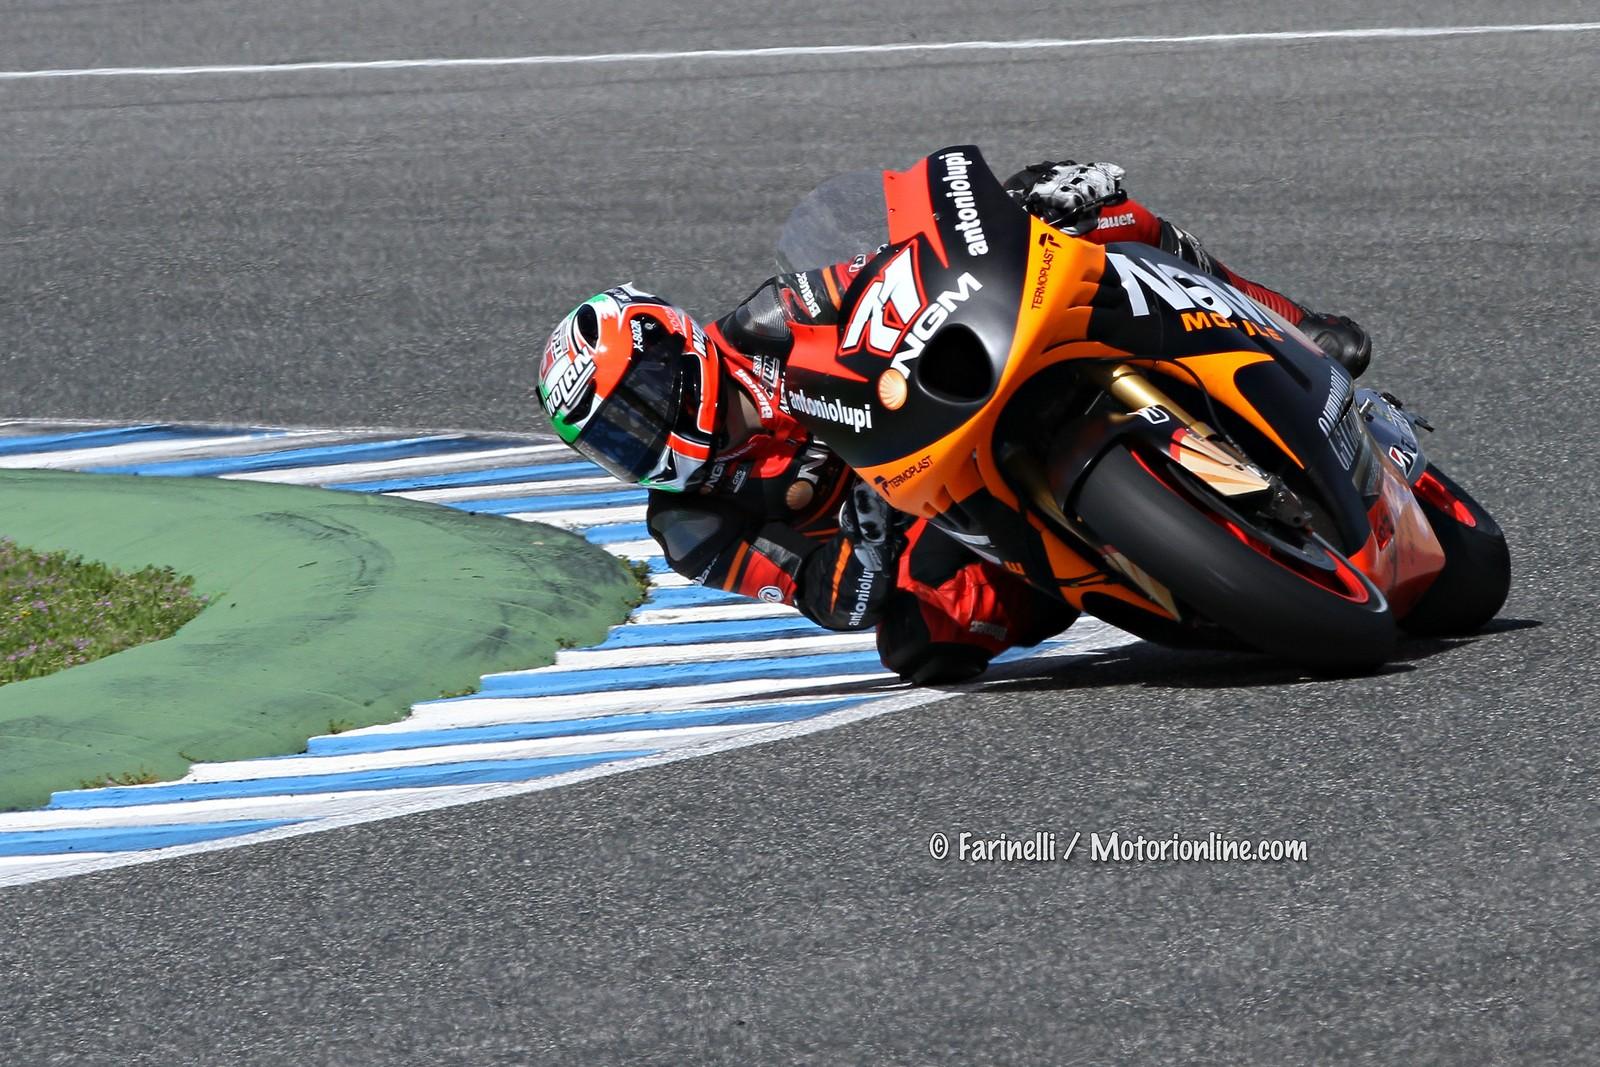 Test Irta Jerez 2013 2013Day_3 Foto MotoGP alta risoluzione 22 di 31